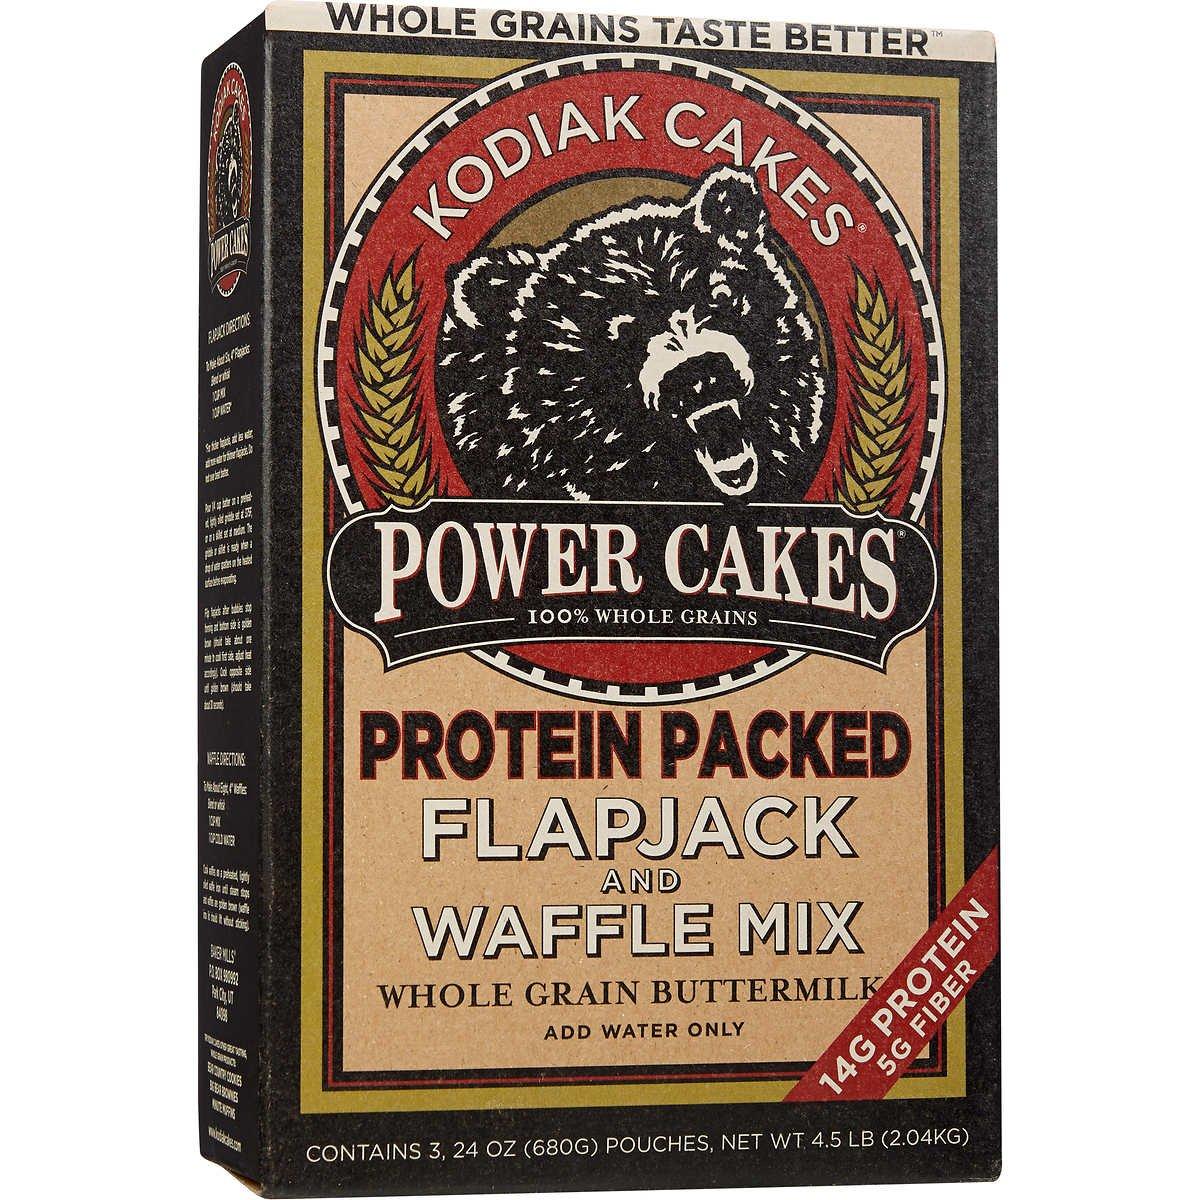 Kodiak Cakes Power Cakes: Flapjack and Waffle Mix Whole Grain Buttermilk Net Wt. 4.5 lb